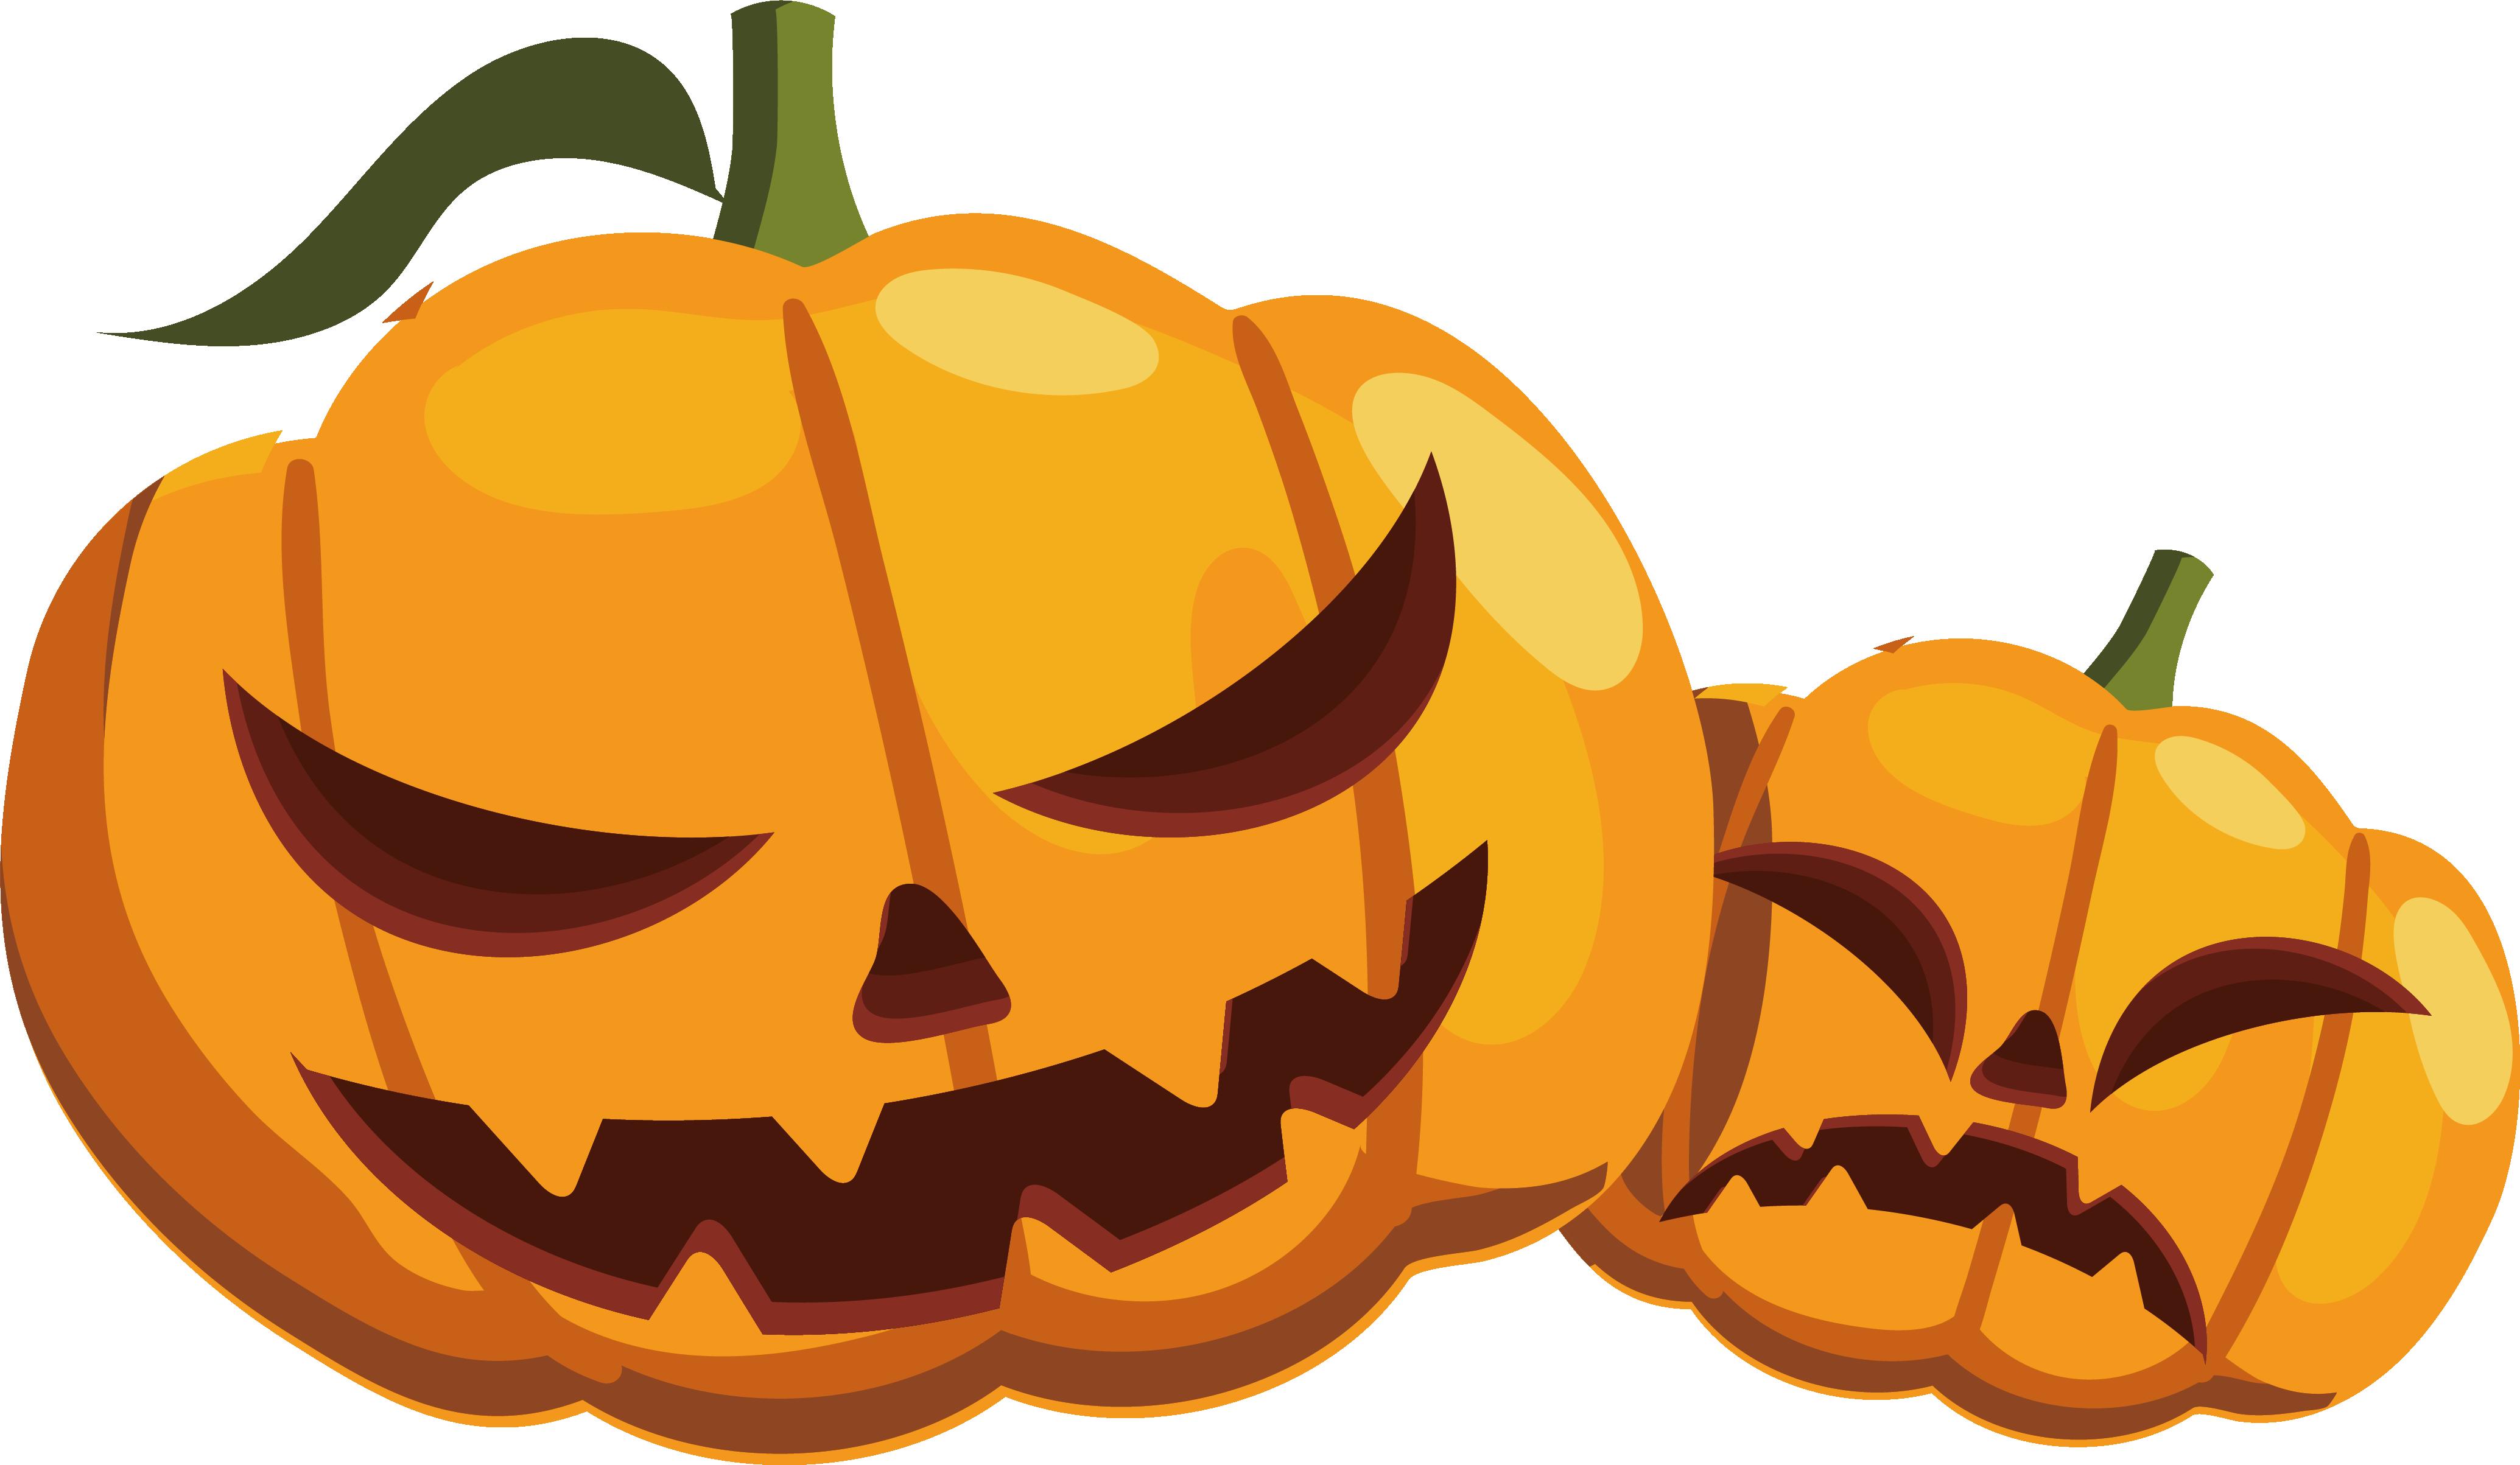 Free halloween dog pumpkin clipart graphic transparent download Calabaza Pumpkin Halloween - Halloween Pumpkin monster 4139*2407 ... graphic transparent download